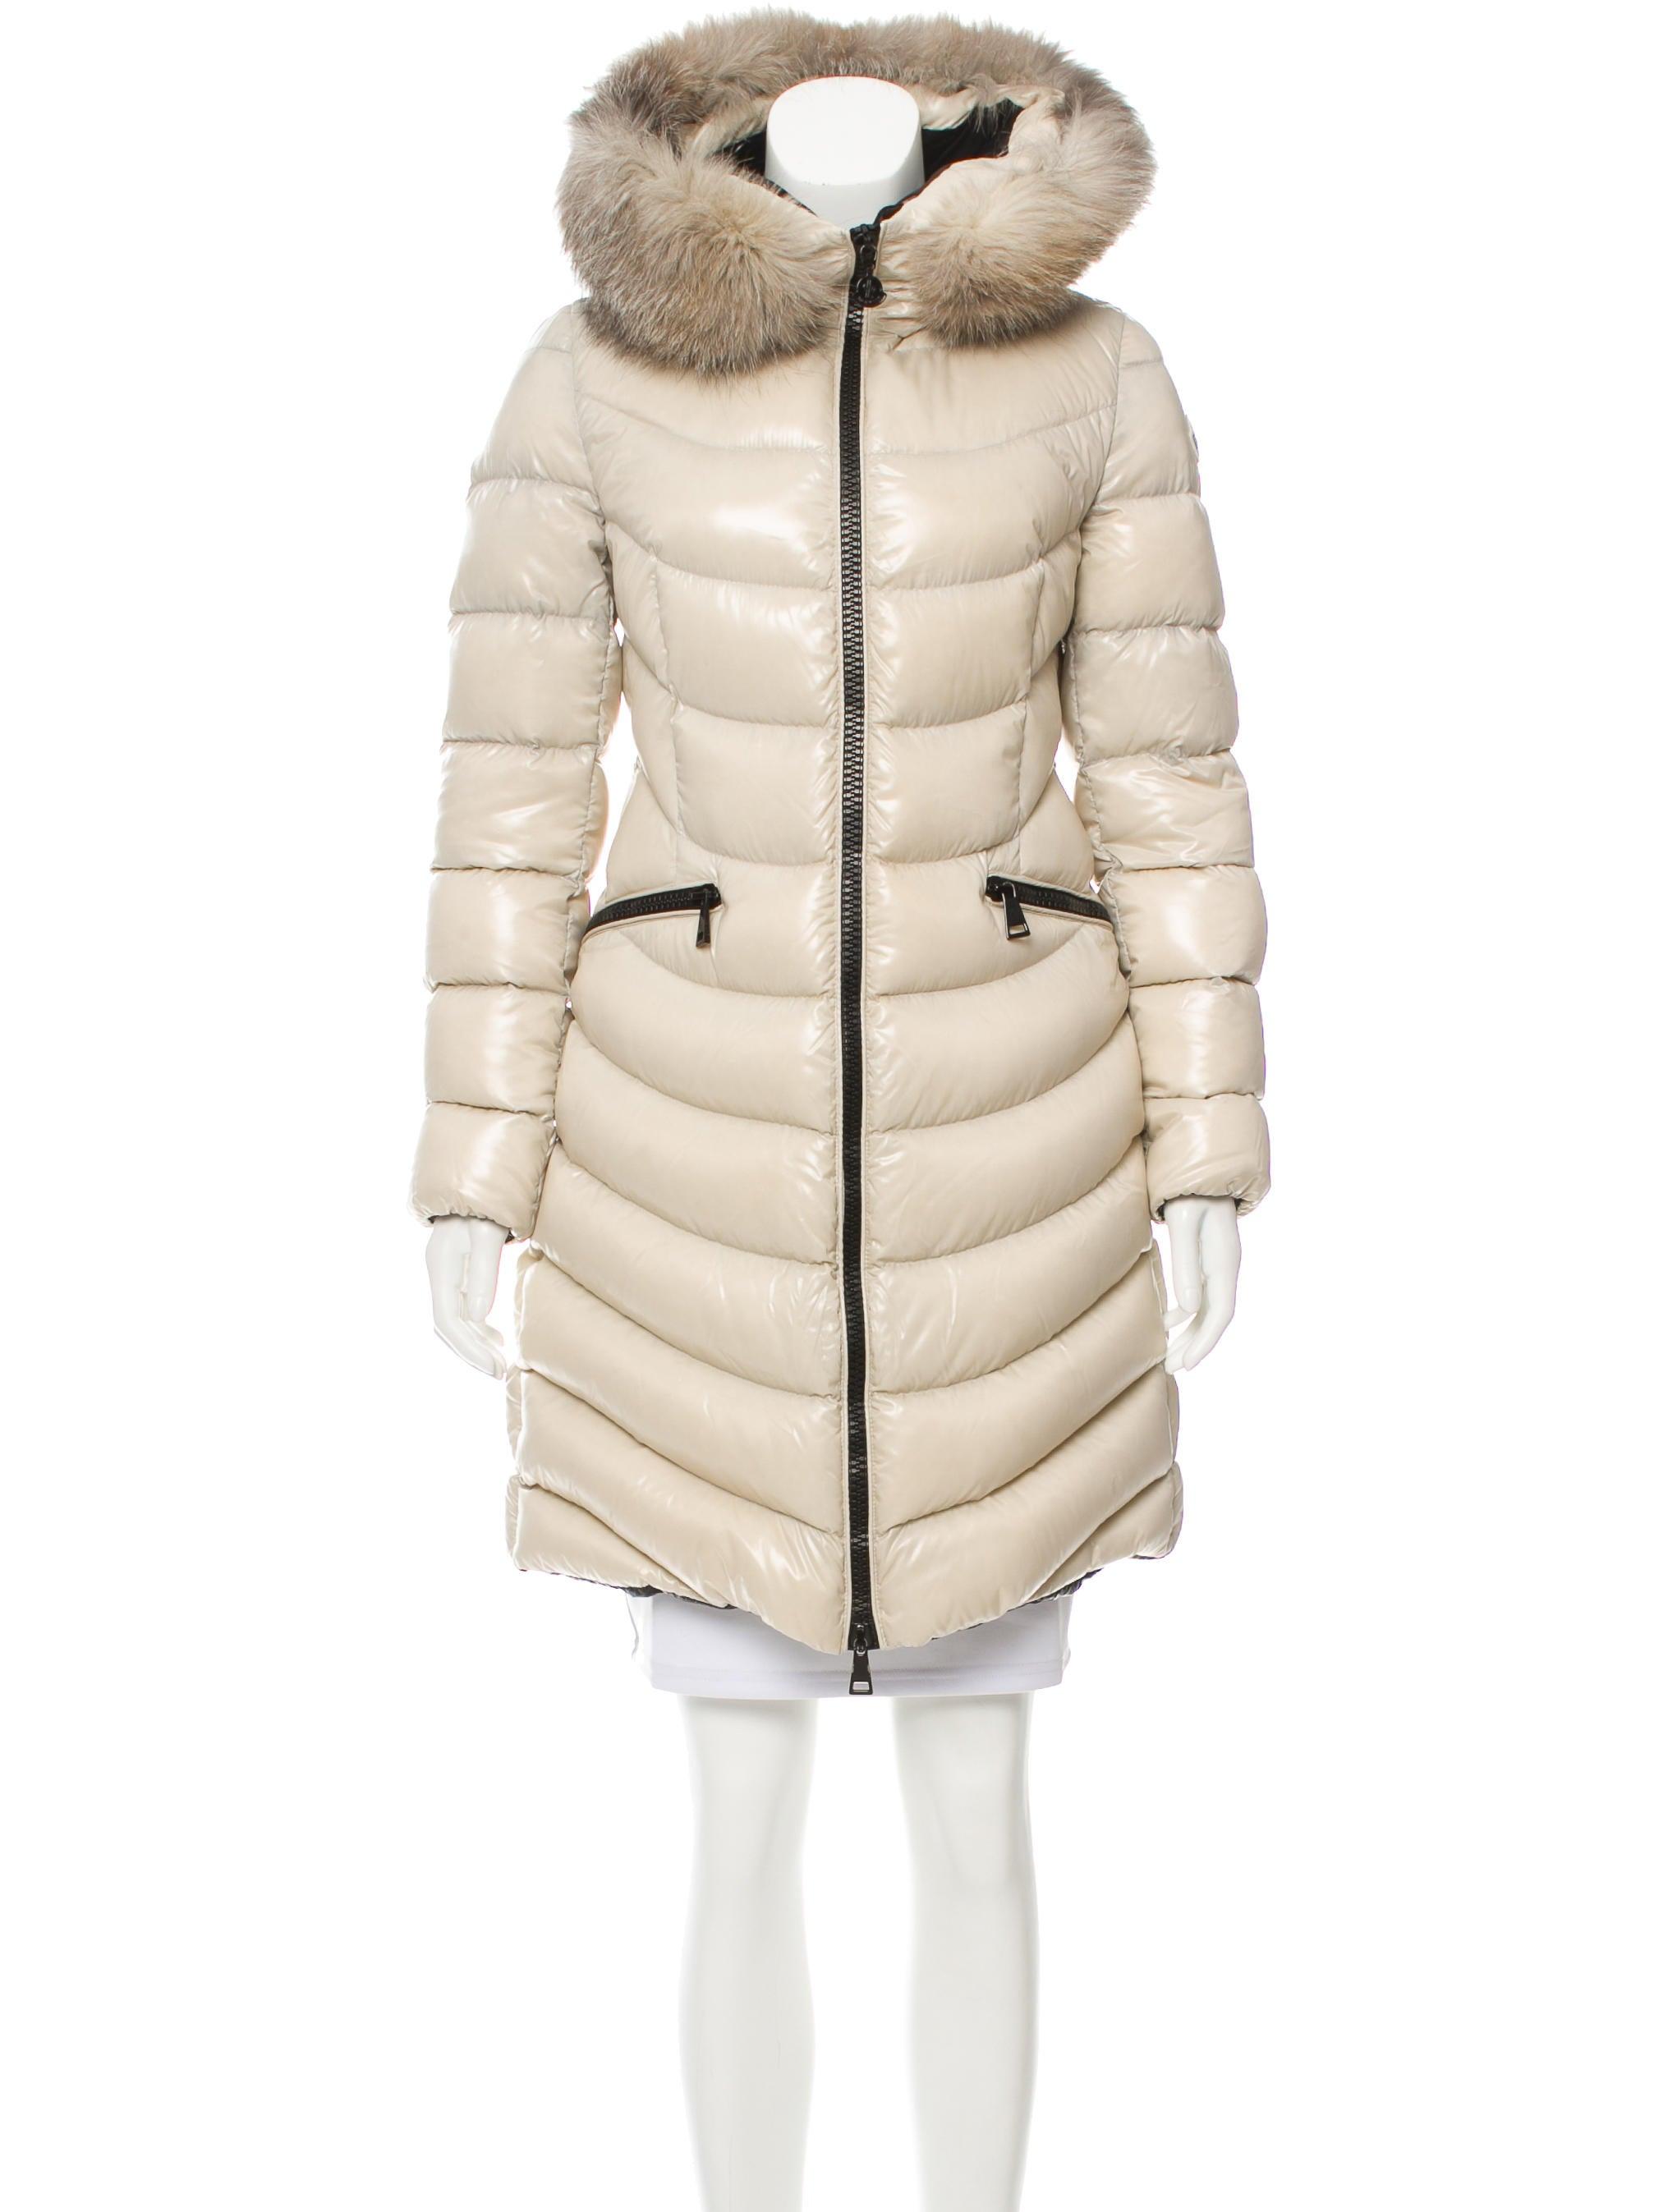 moncler aphia coat